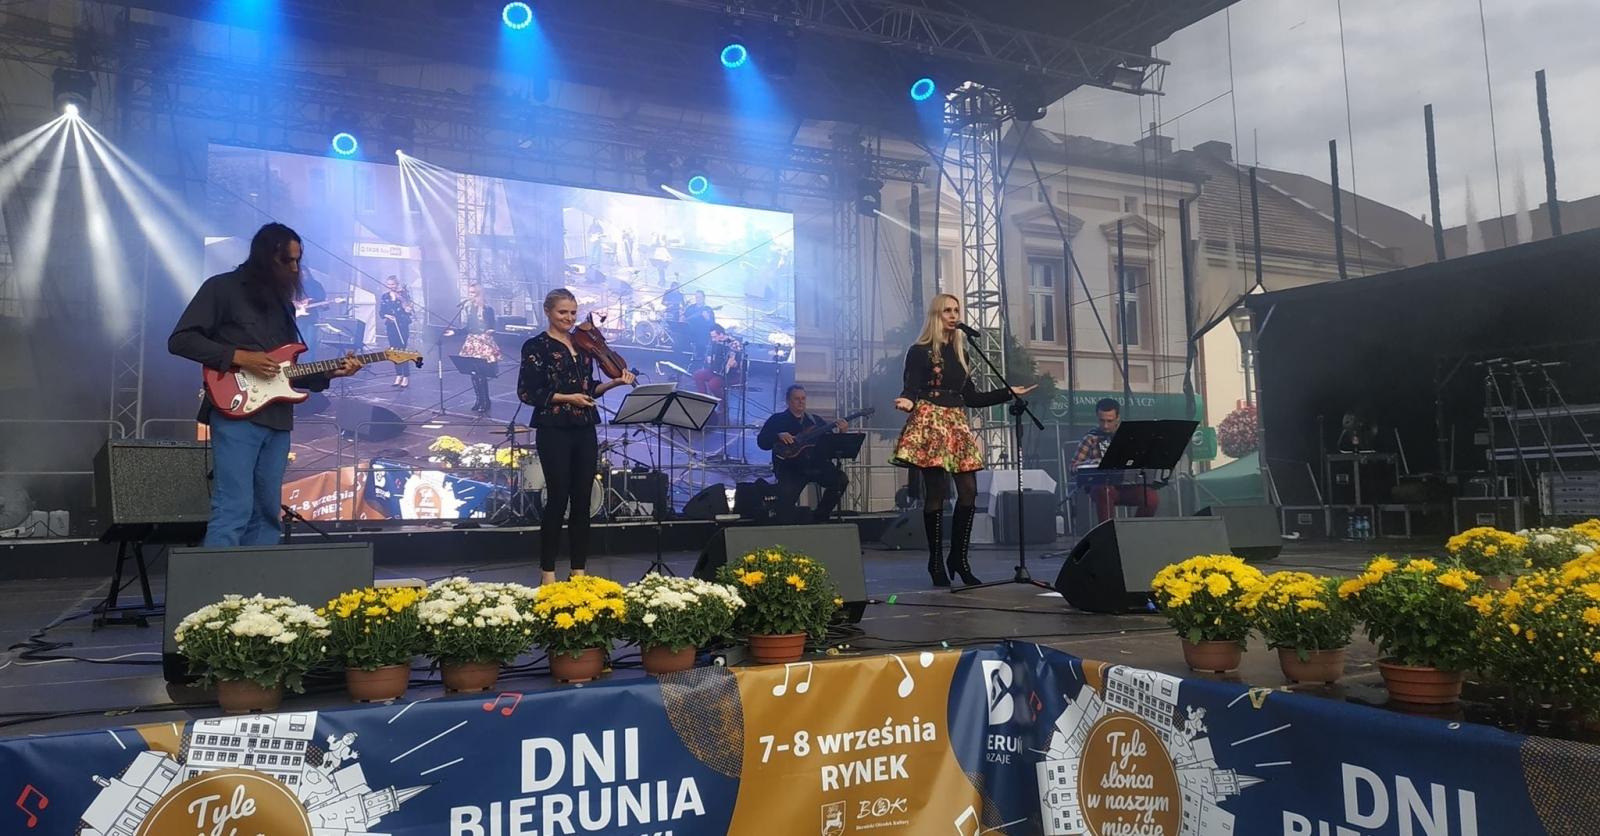 muzyka-gruzińska-macedońska-bałkańska-folkowa-francuska-nivel